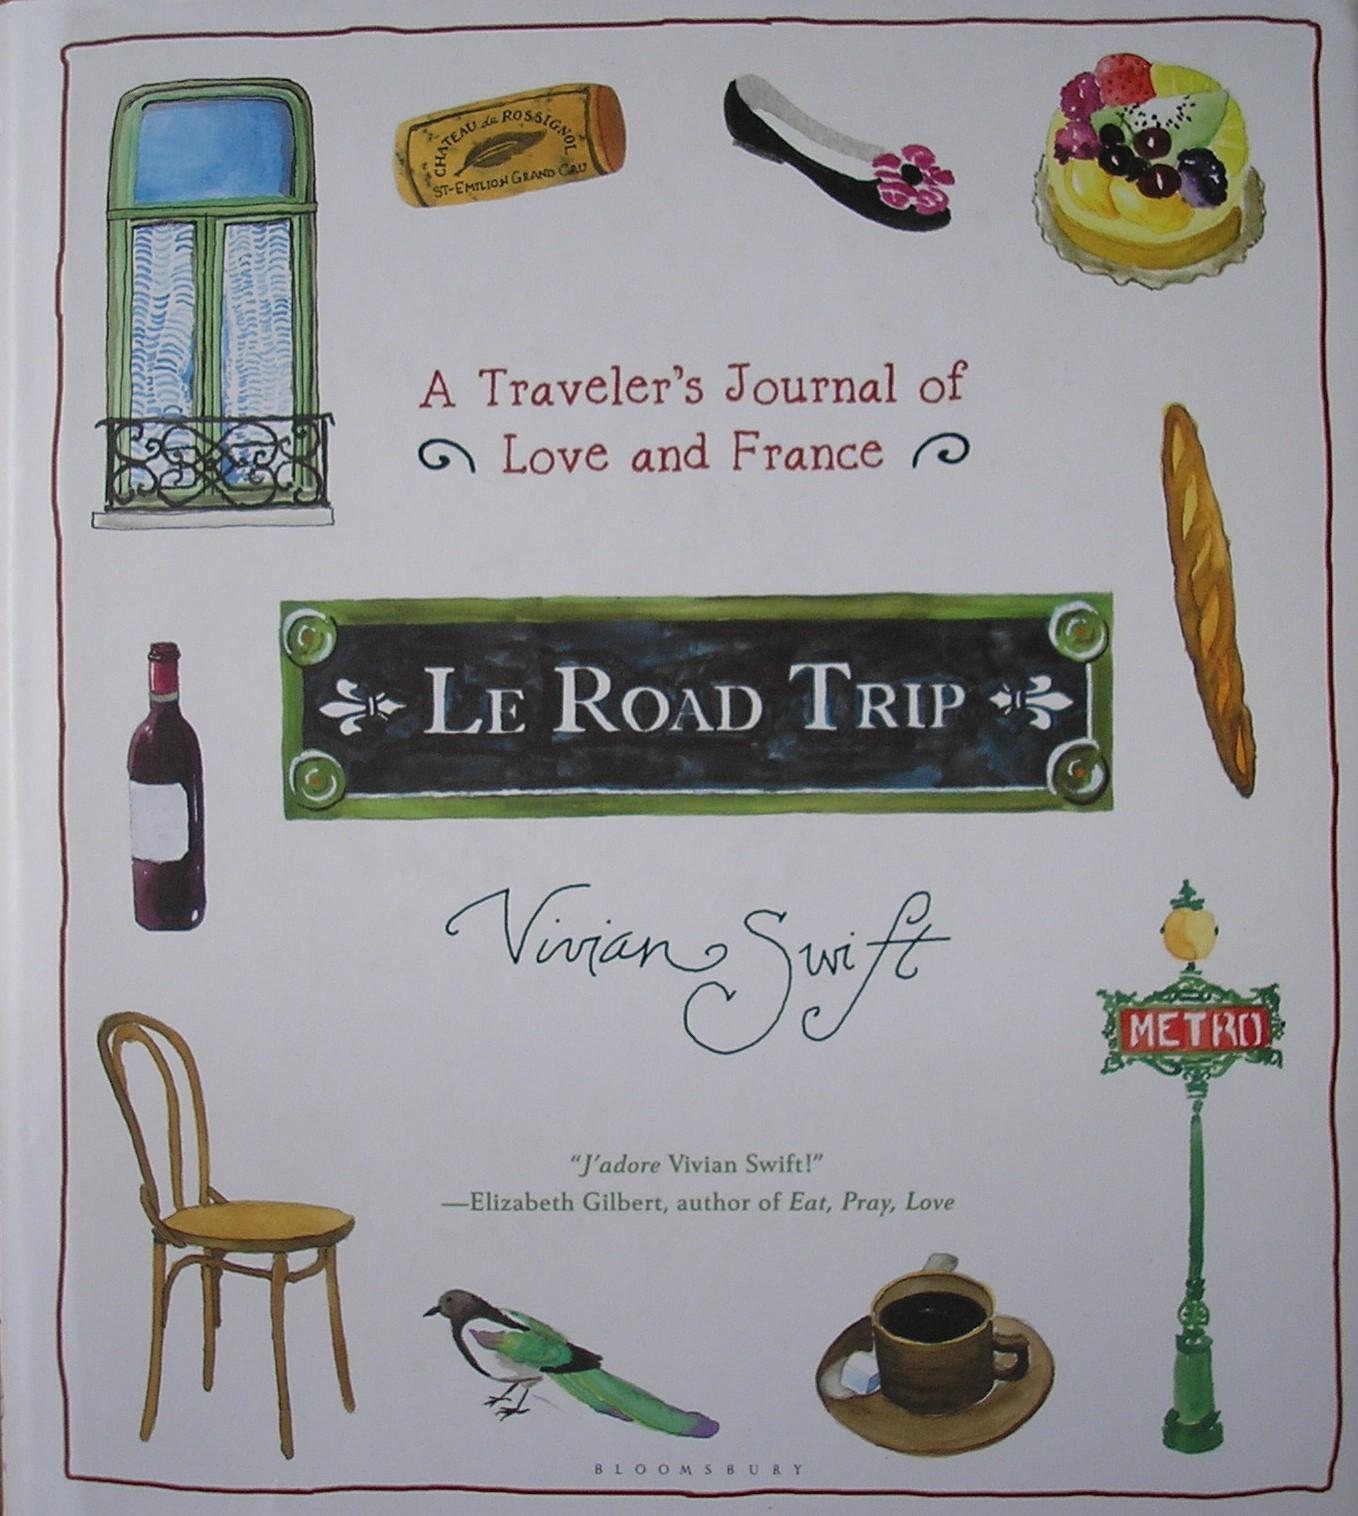 Le Road Trip book